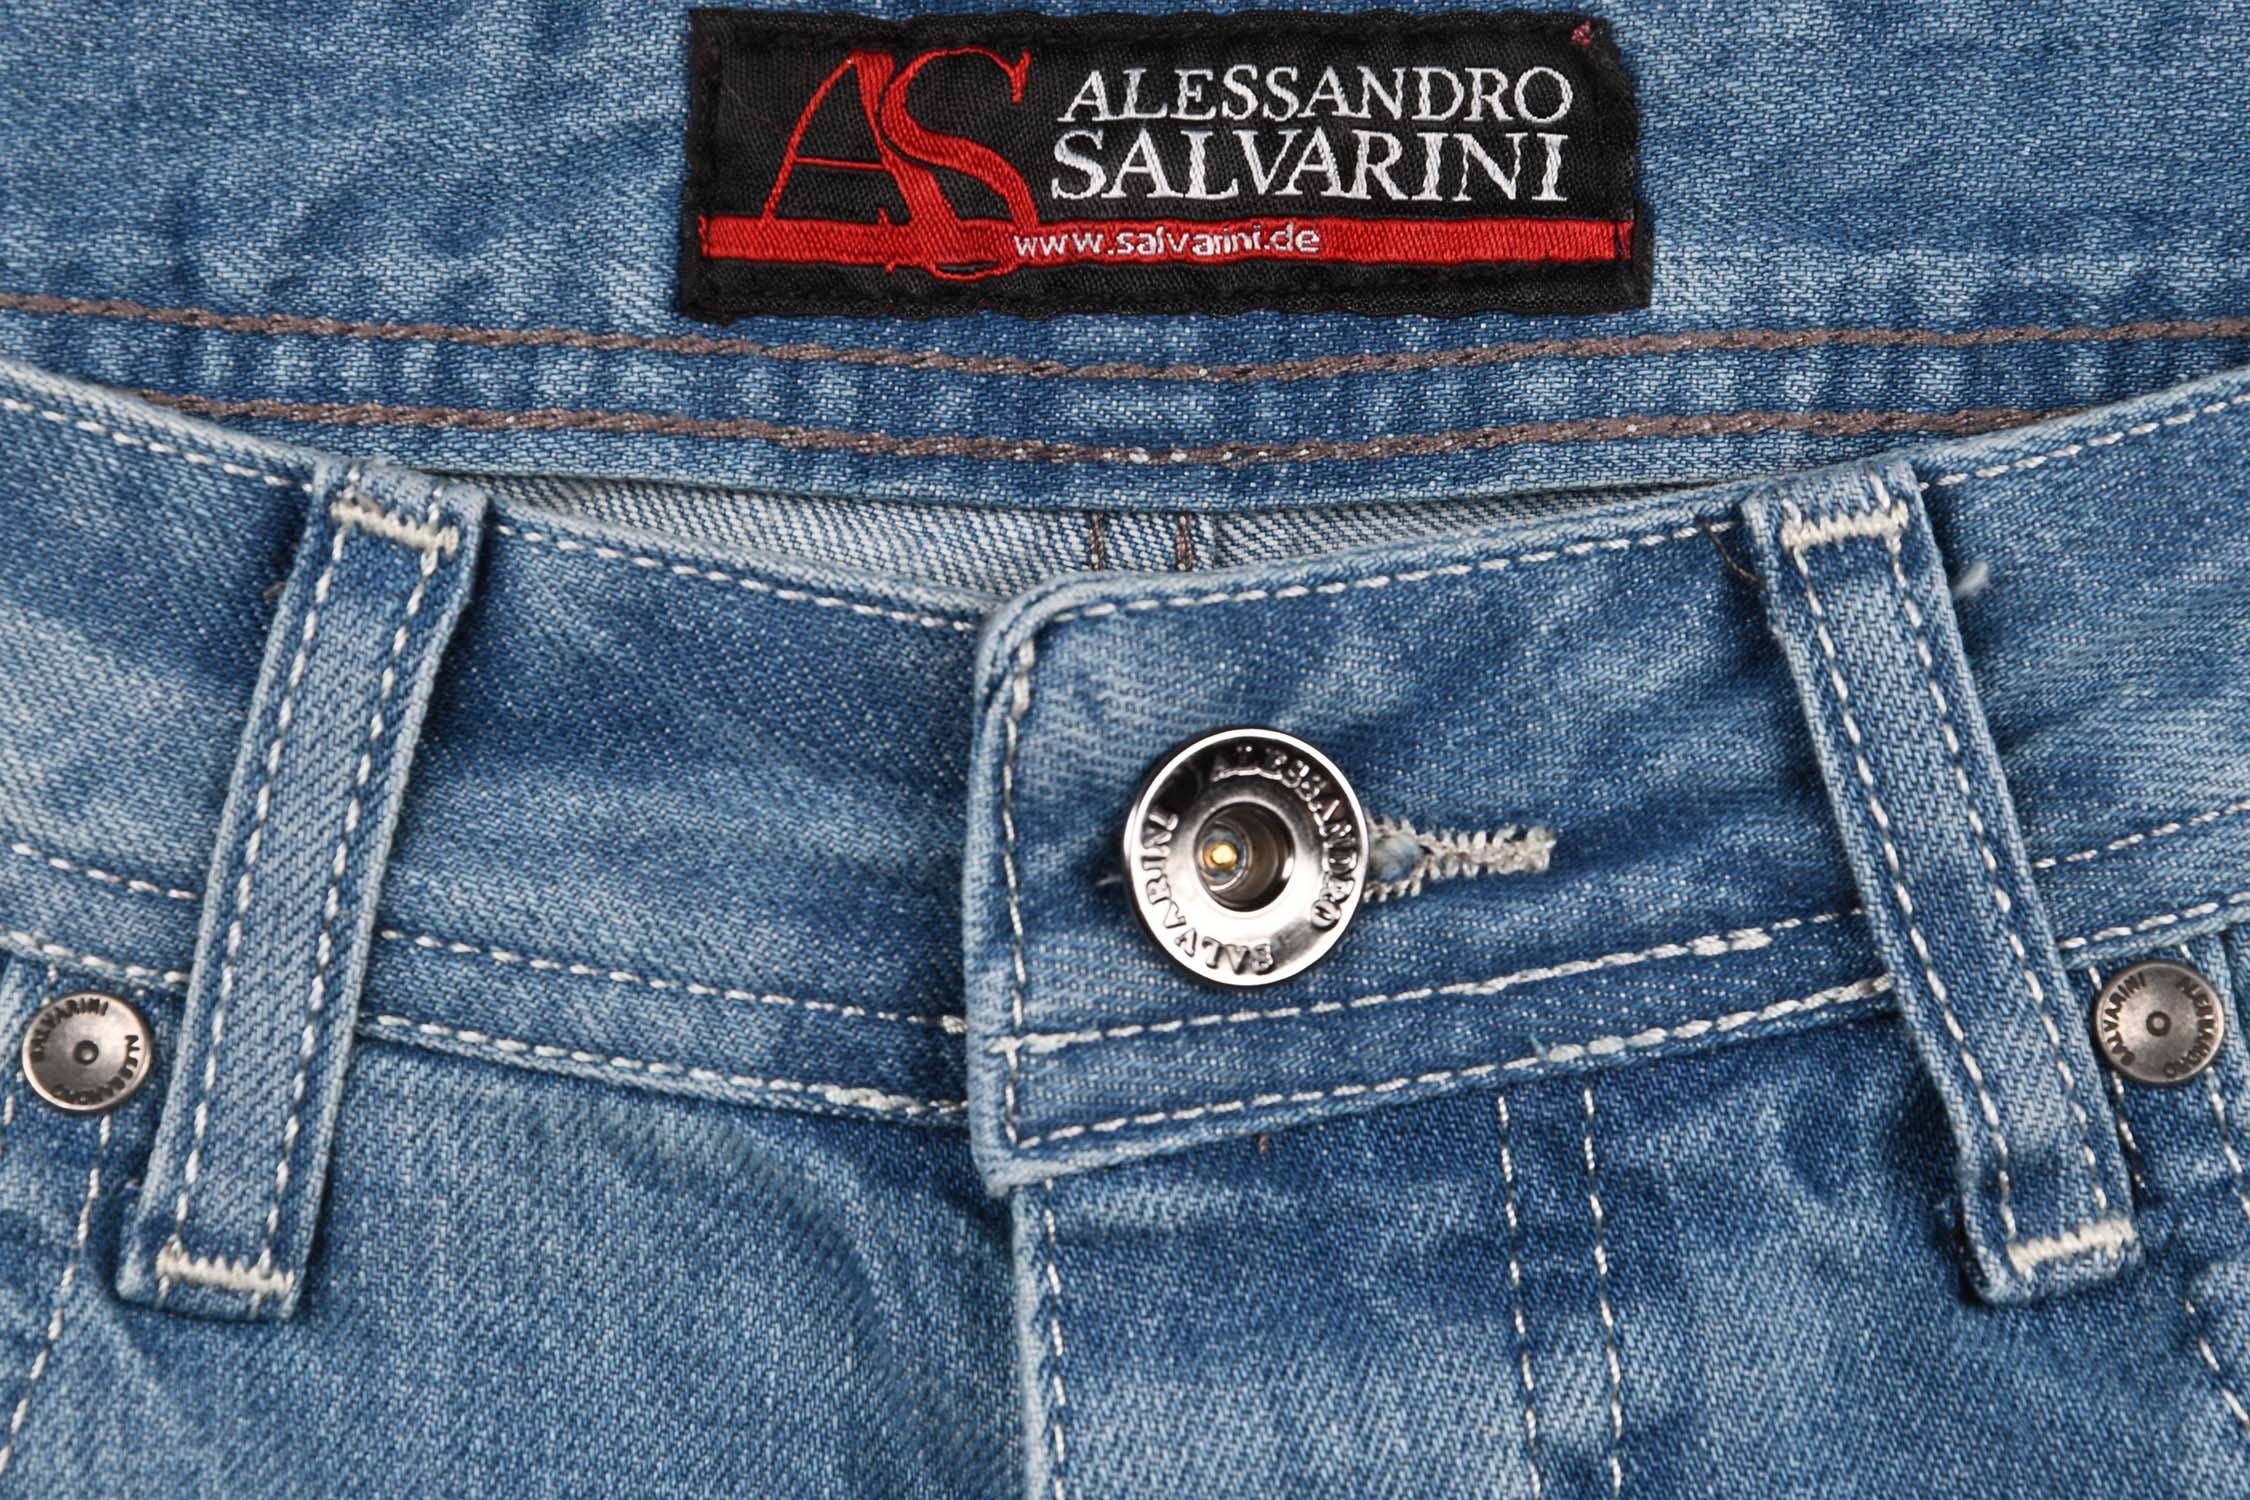 A-Salvarini-Designer-Herren-Jeans-Short-kurze-Sommer-Hose-Jeansshorts-Bermuda Indexbild 6